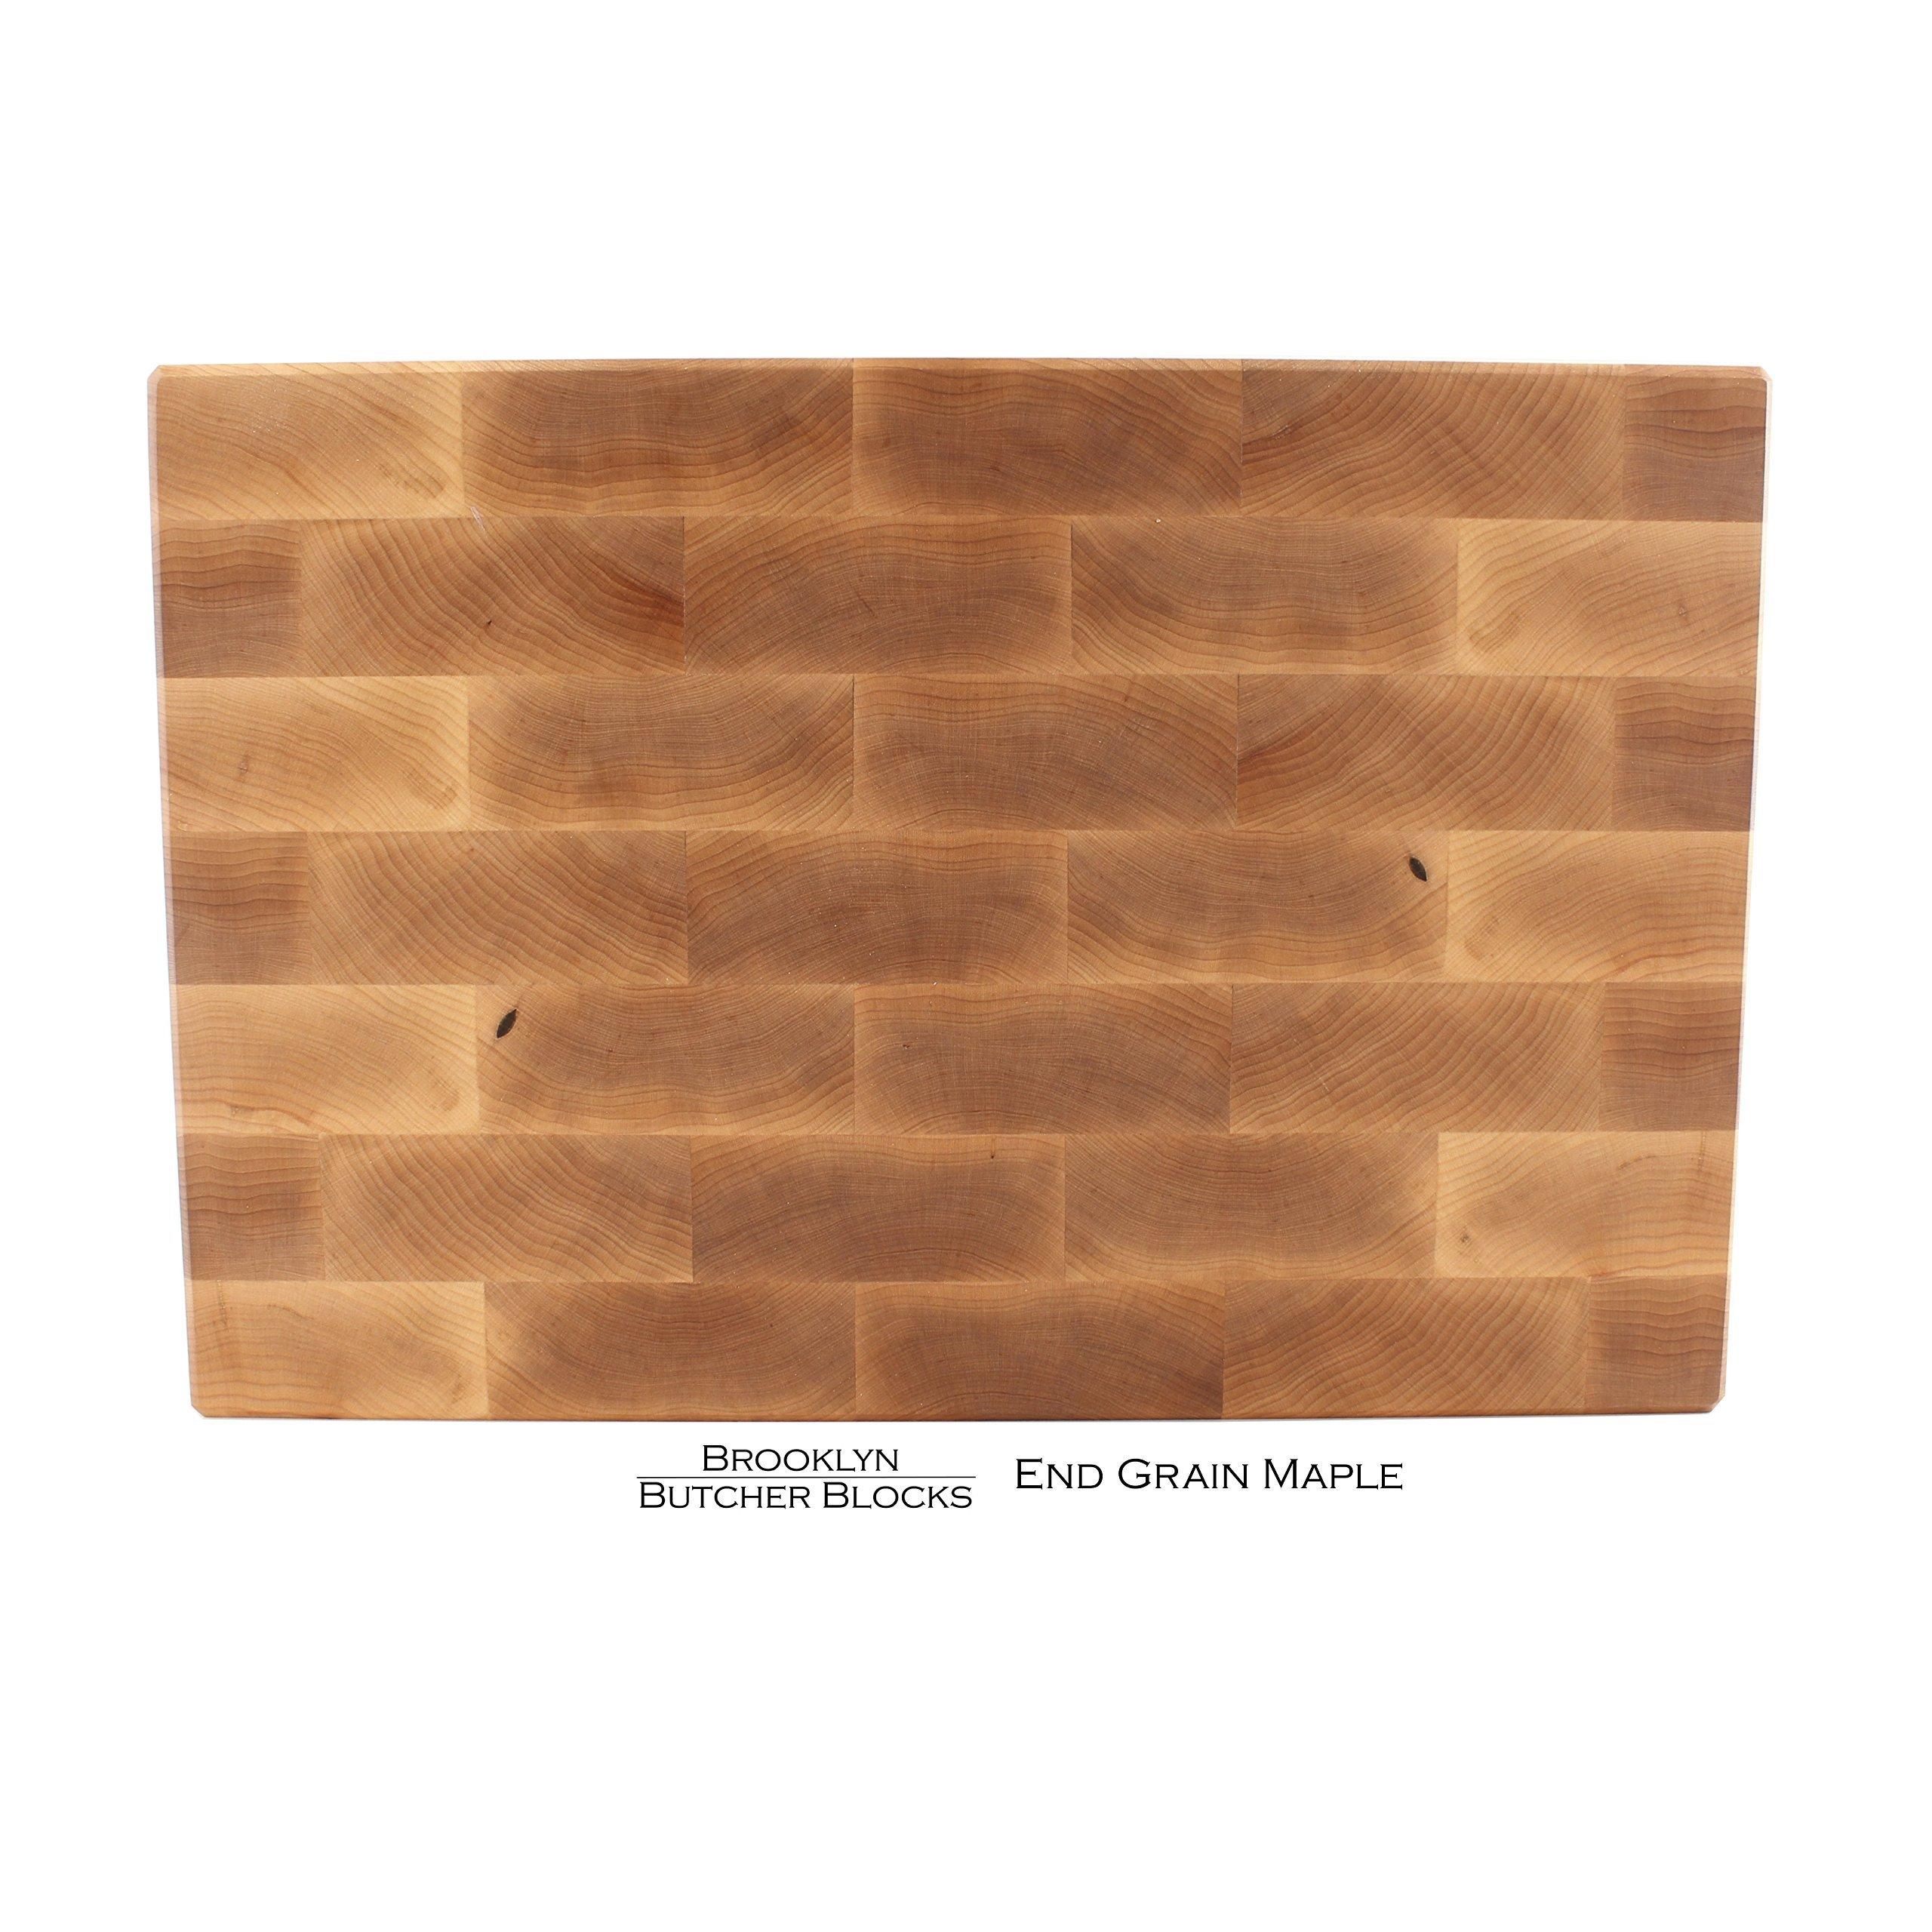 12 x 18 x 2 End Grain Brickwork Butcher Block by Brooklyn Butcher Blocks (Image #2)